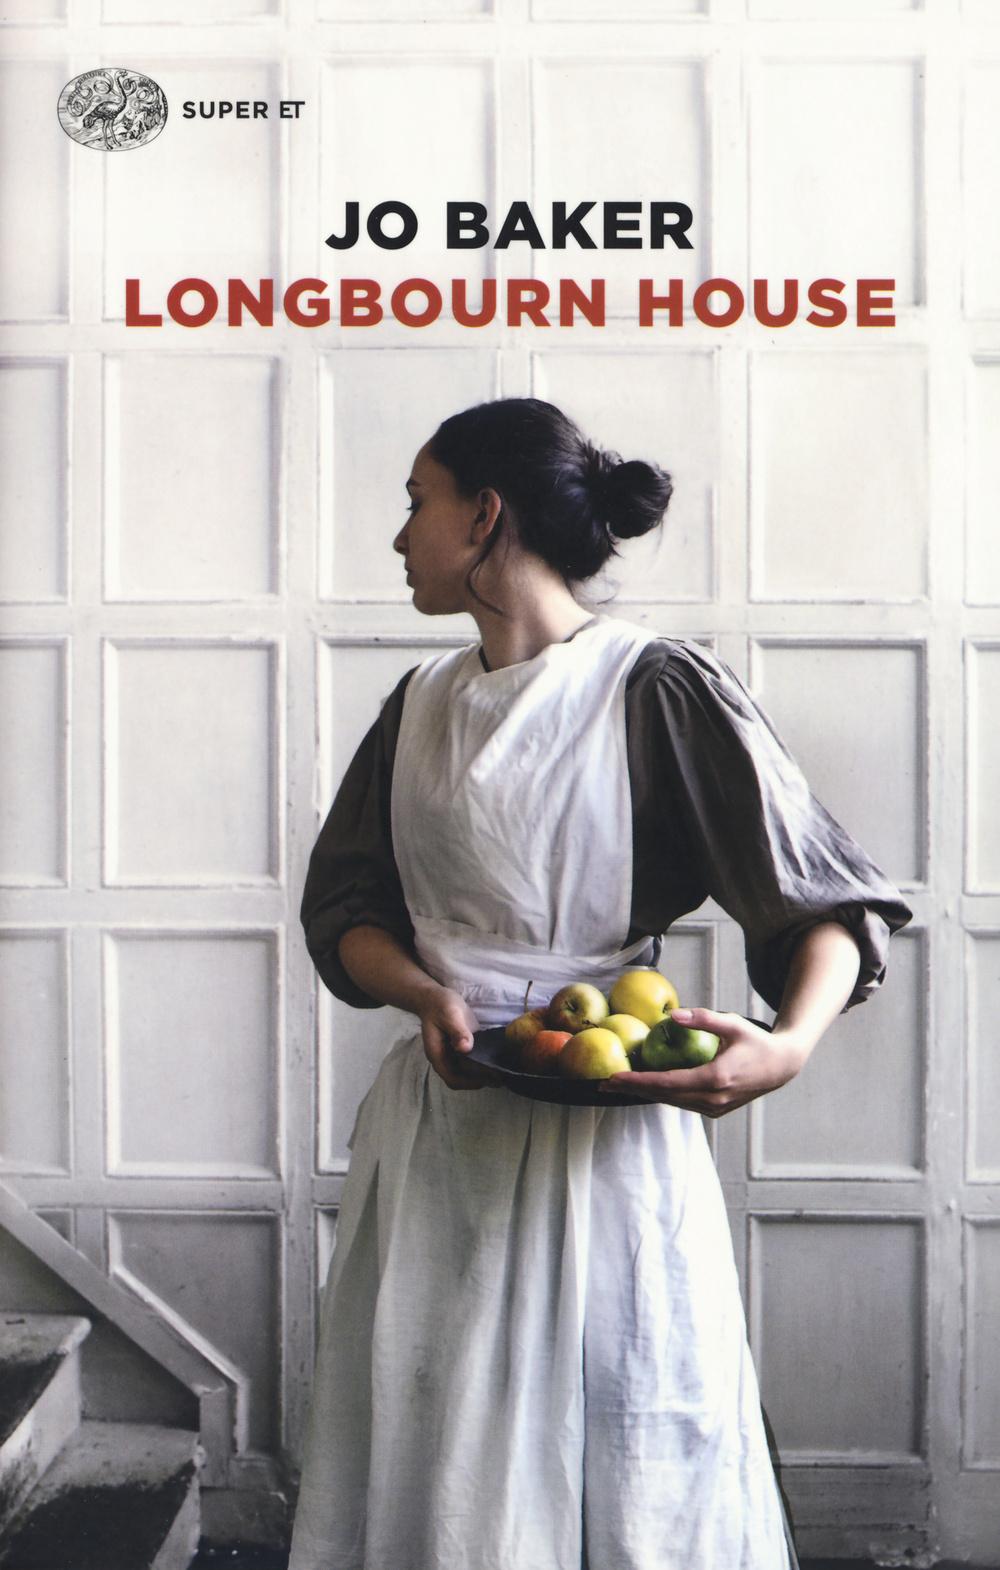 Longbourn House